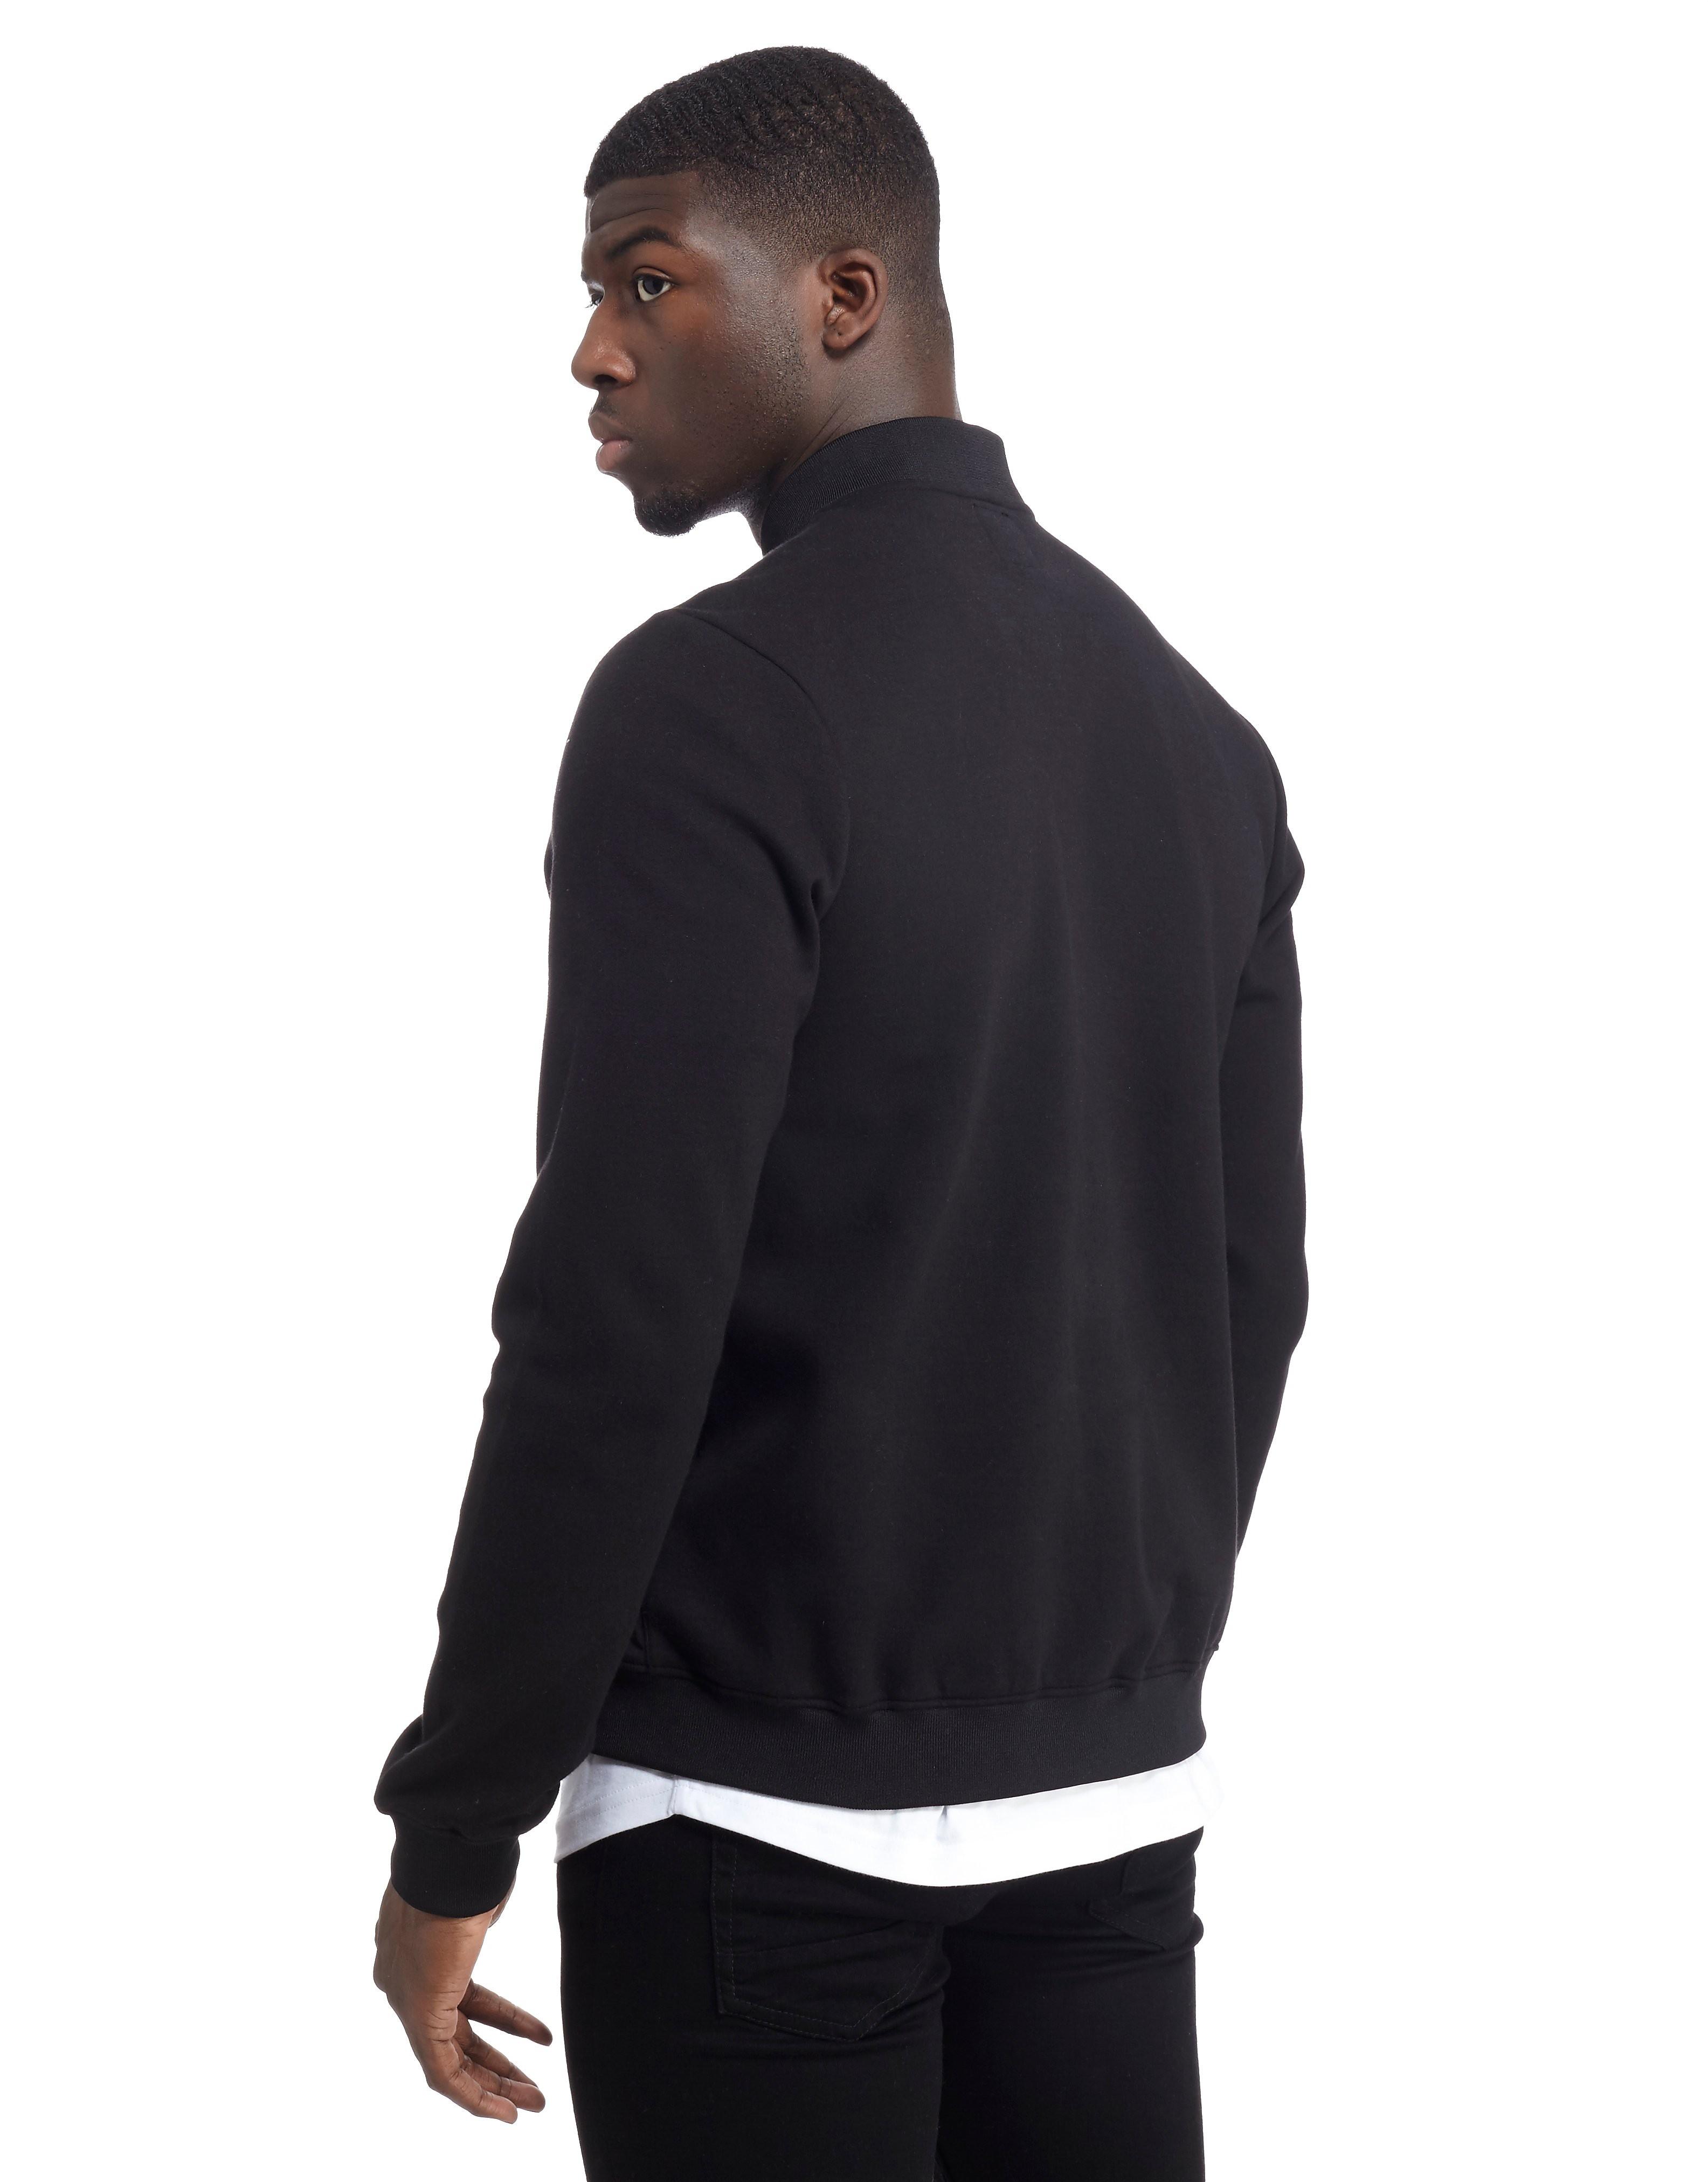 Duffer of St George Black Label Monde Jacket